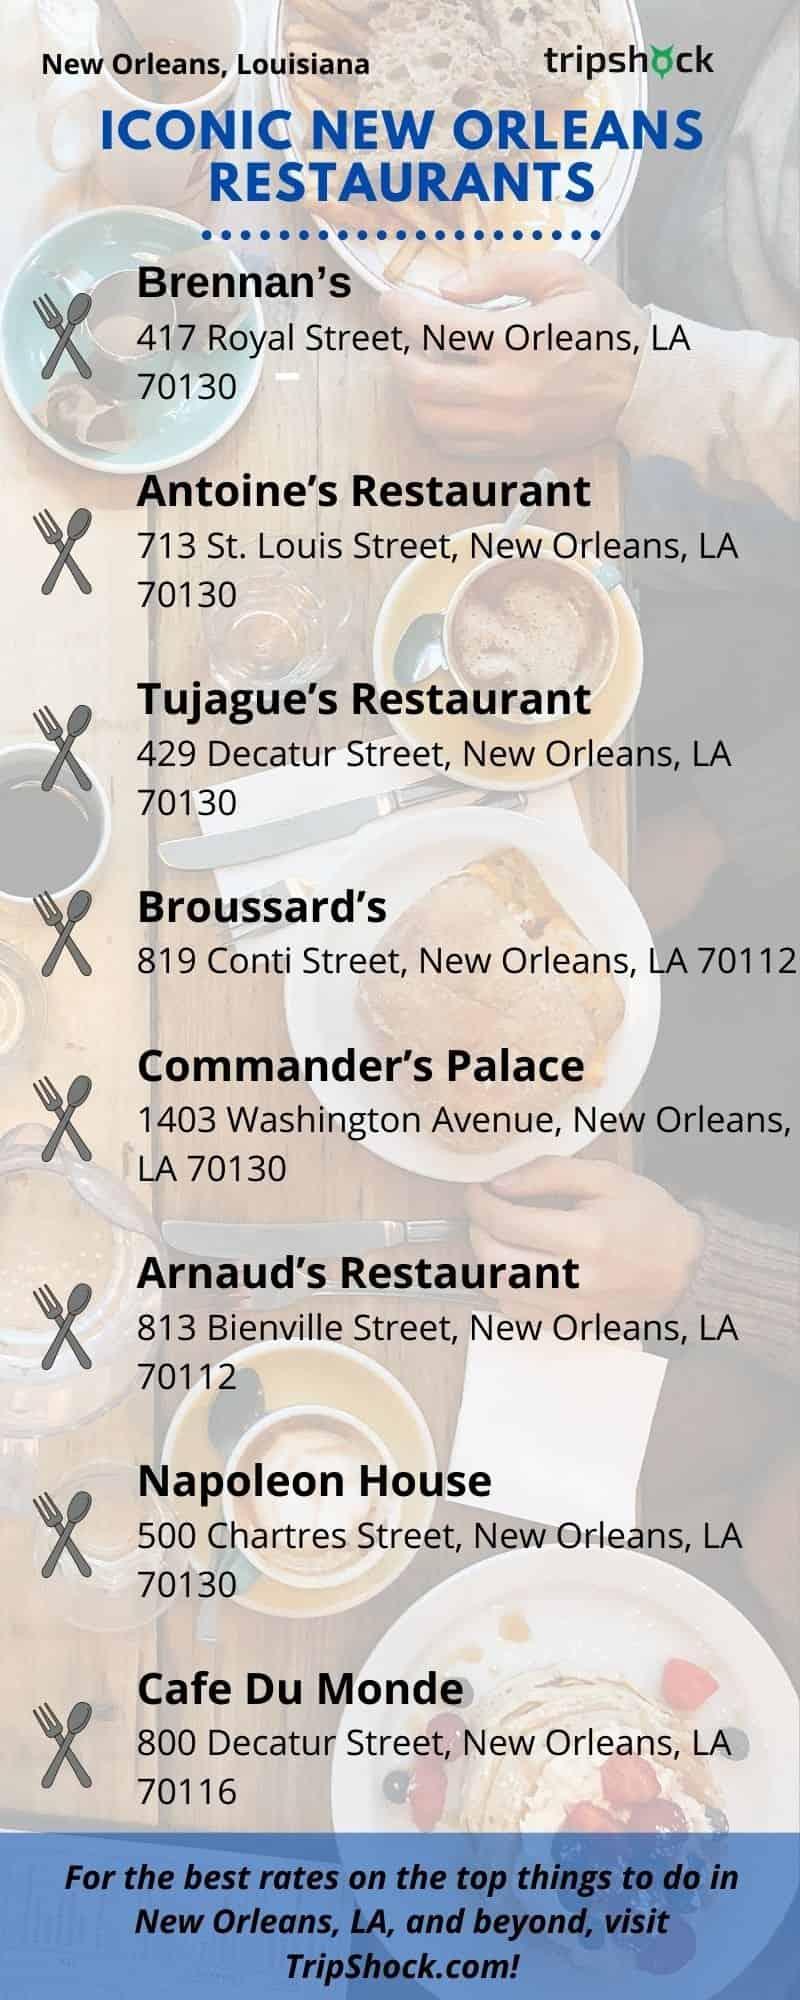 Iconic New Orleans Restaurants